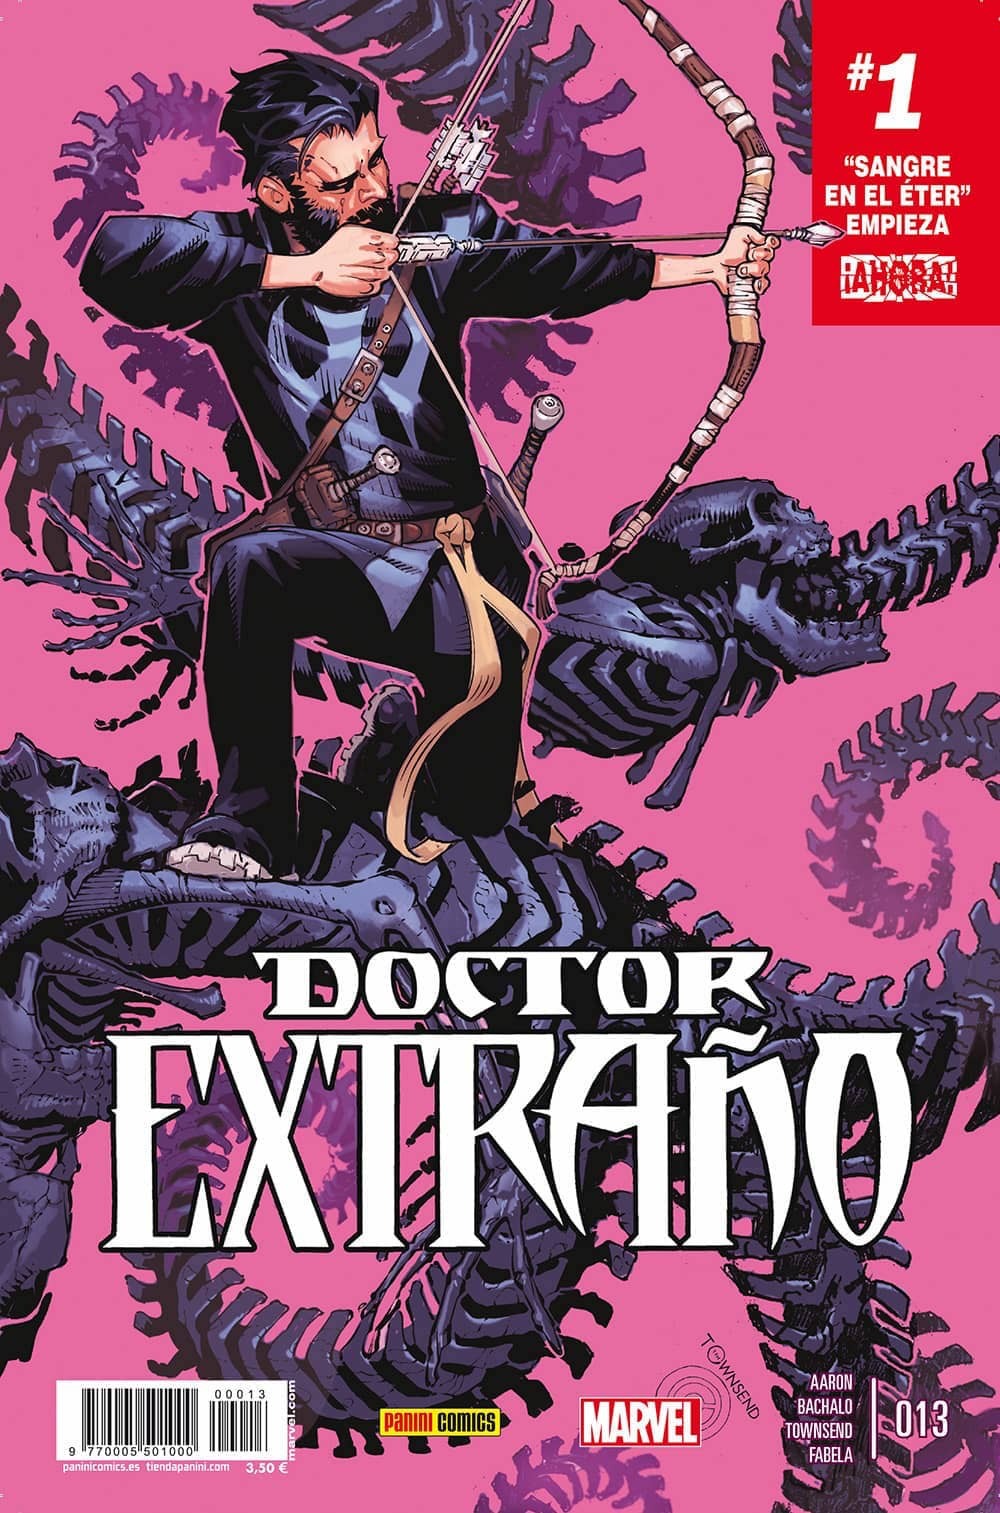 DOCTOR EXTRAÑO 13